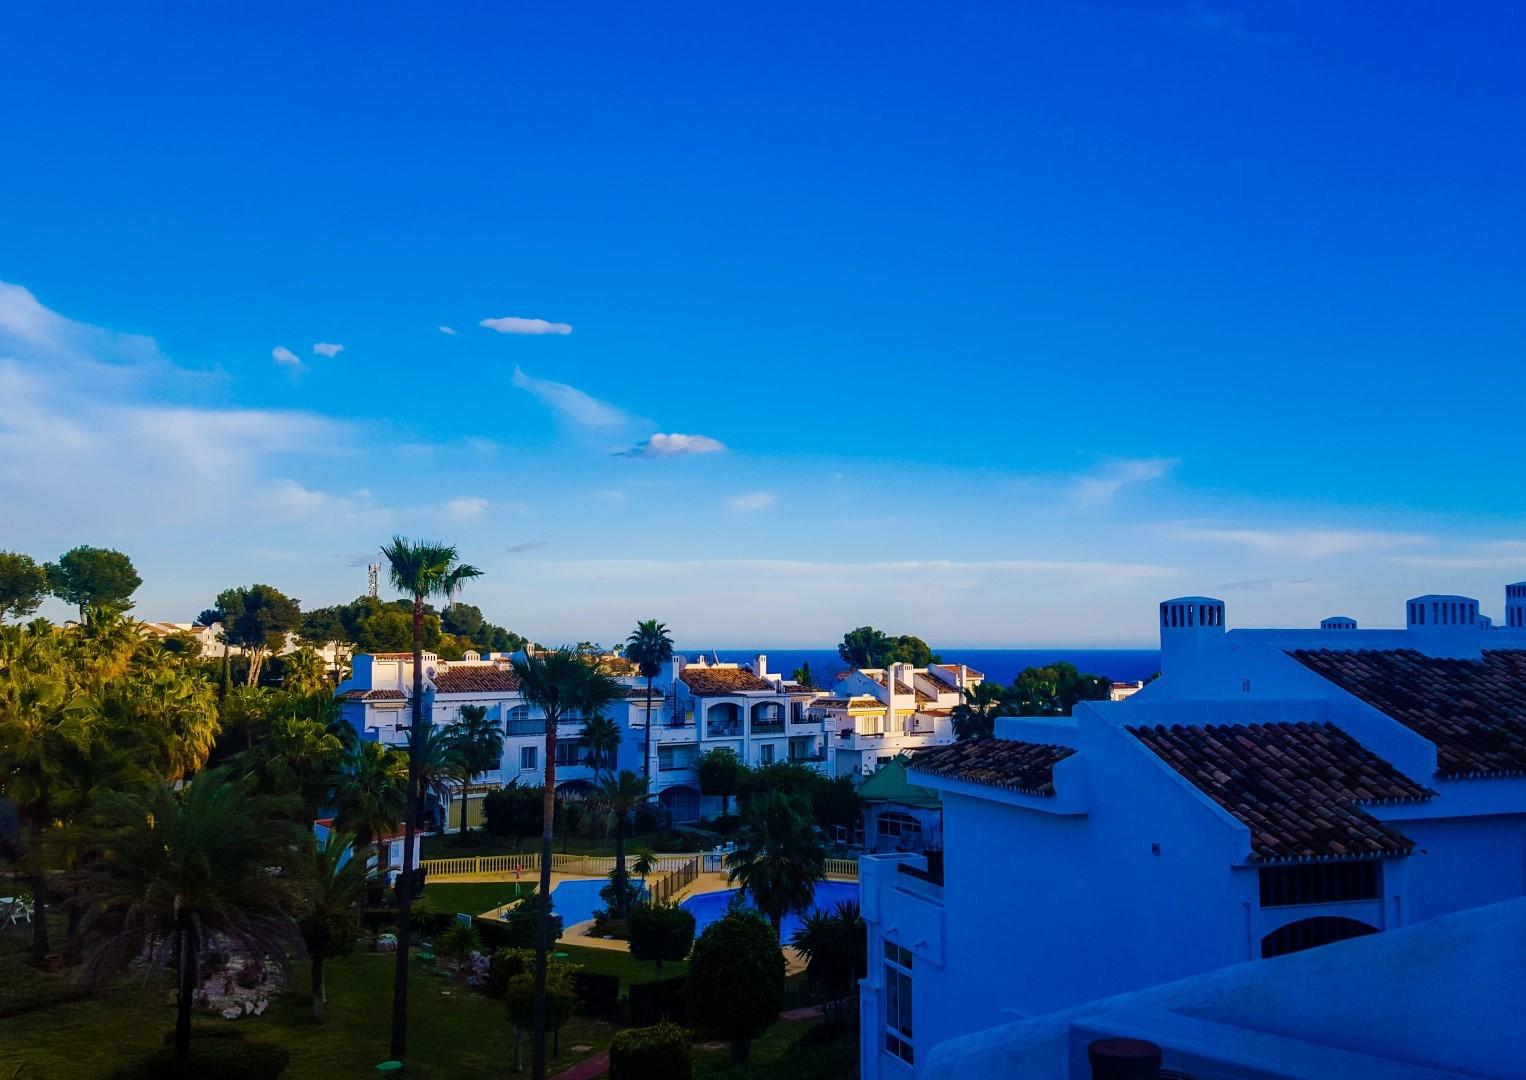 1 Bed Apartment in Riviera del Sol